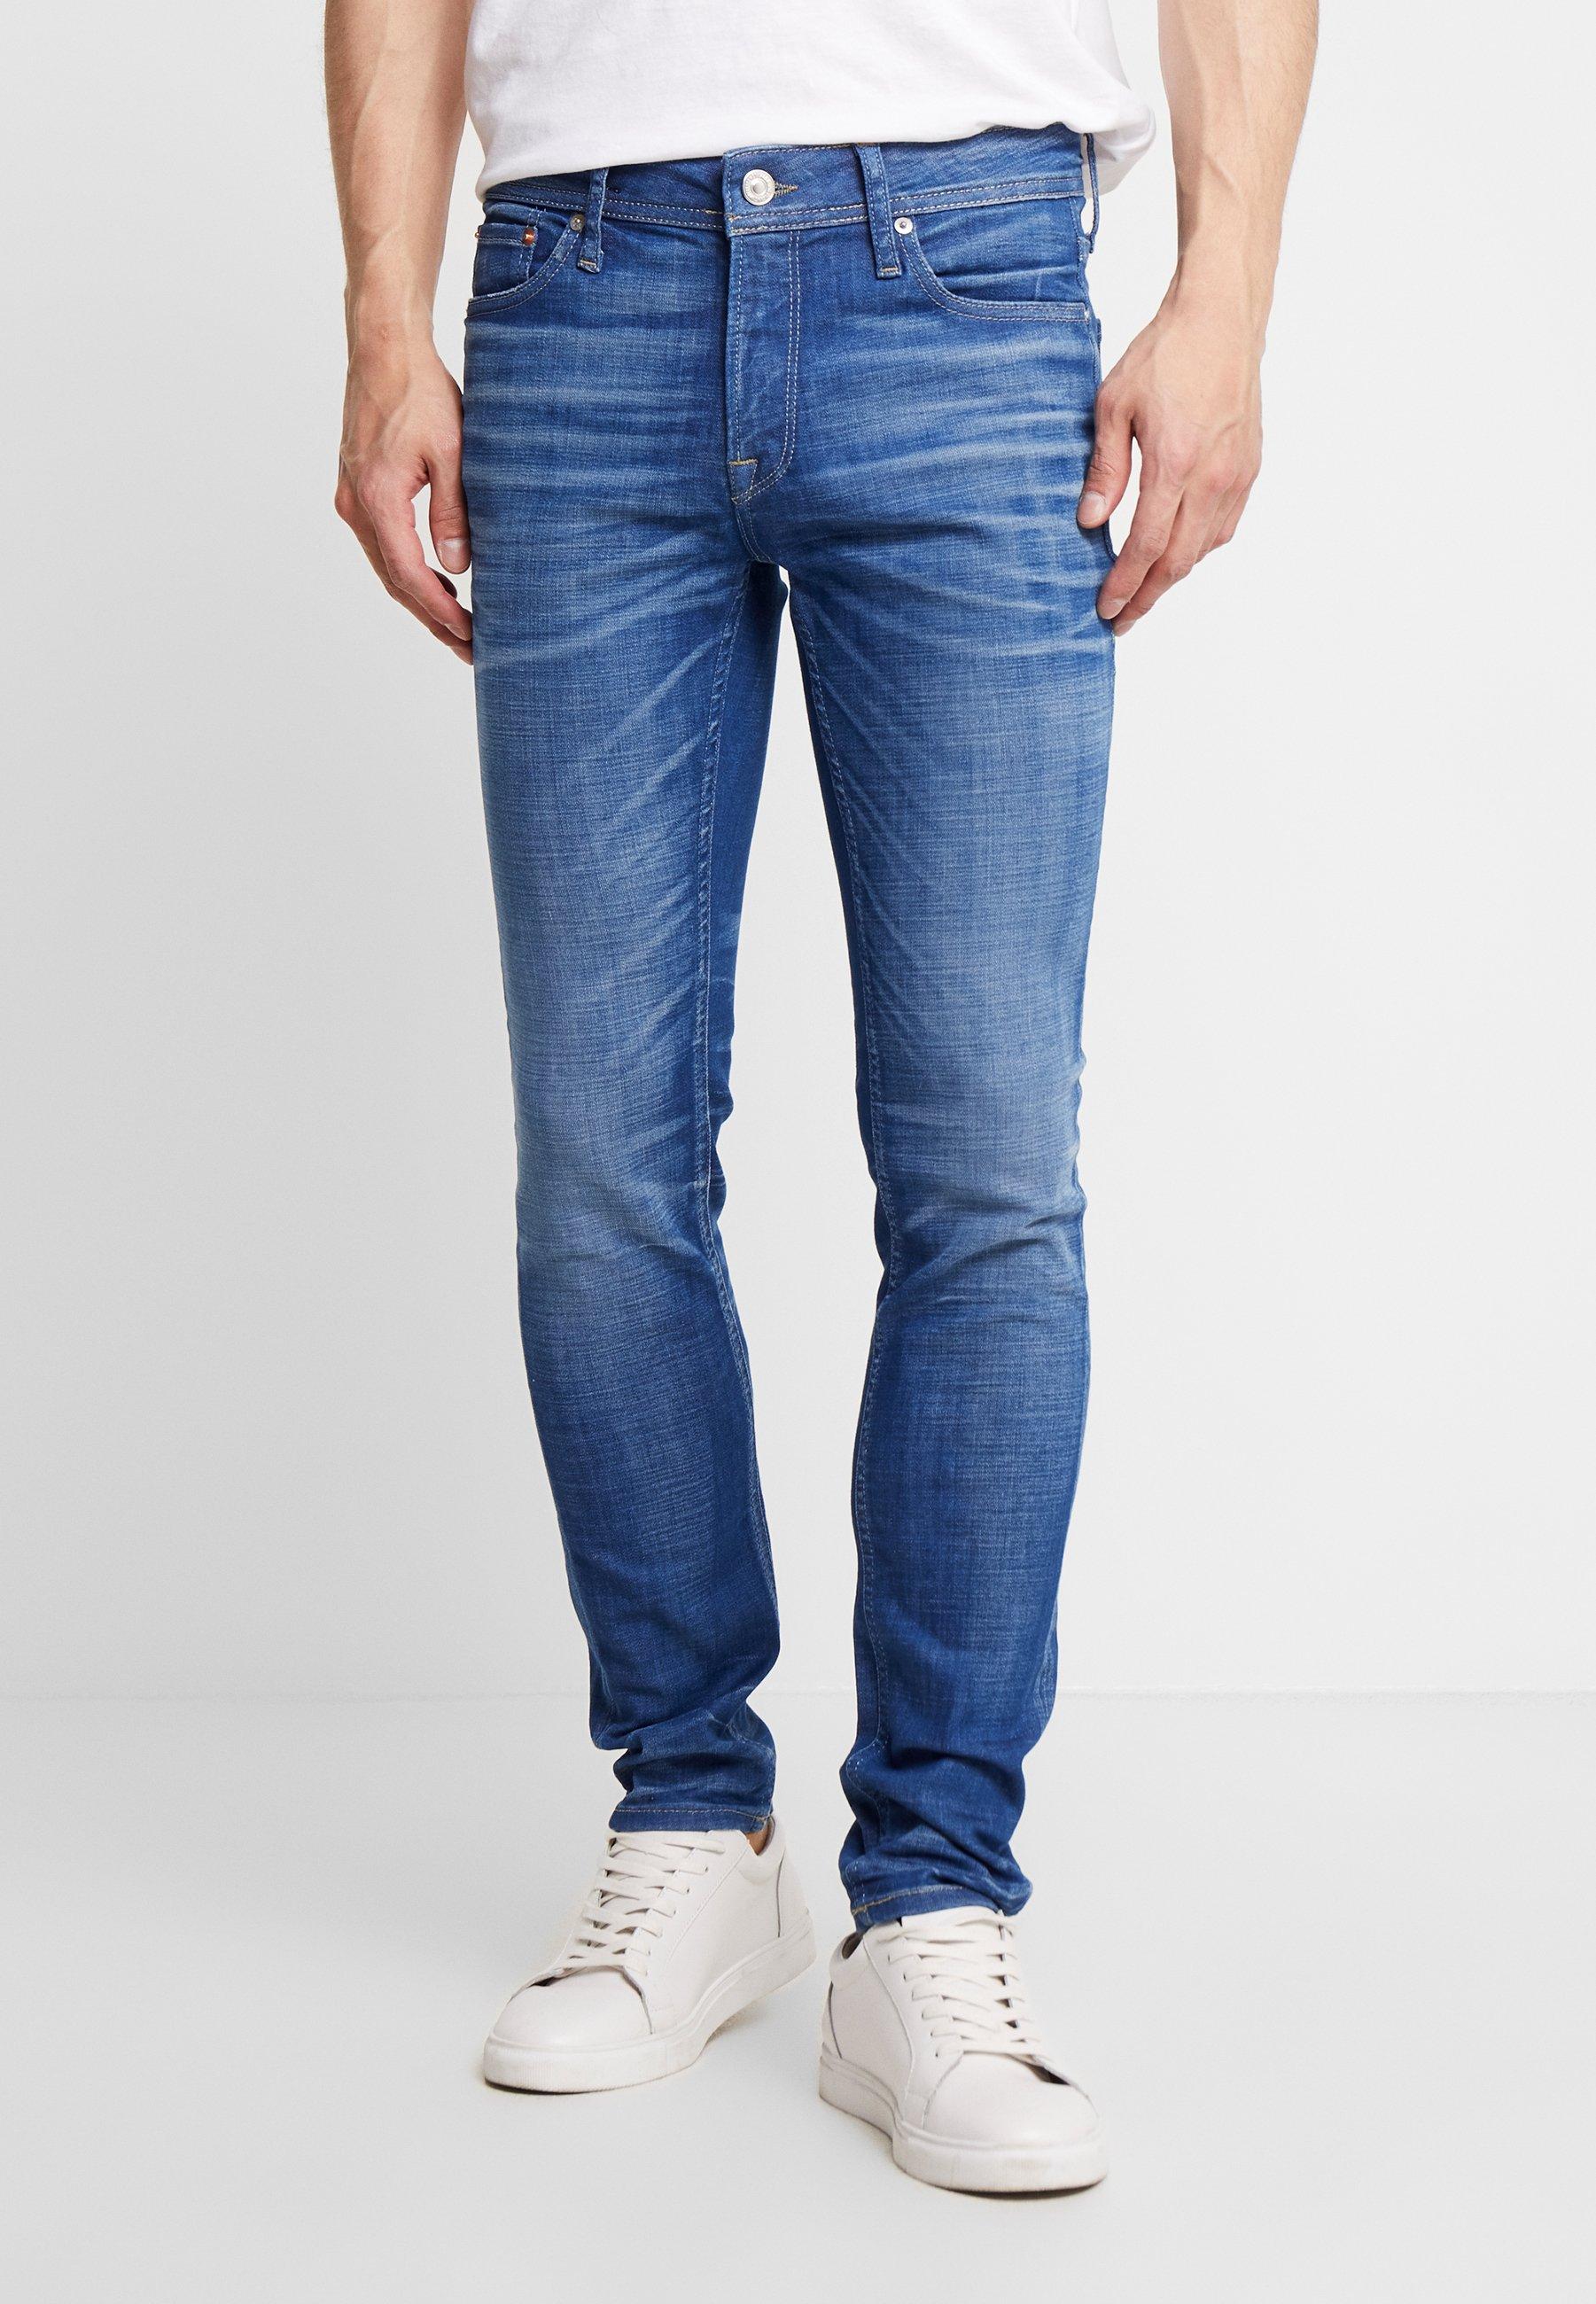 Jones Denim Jjiliam JjoriginalJeans Jackamp; Skinny Blue Jl1uFTcK3